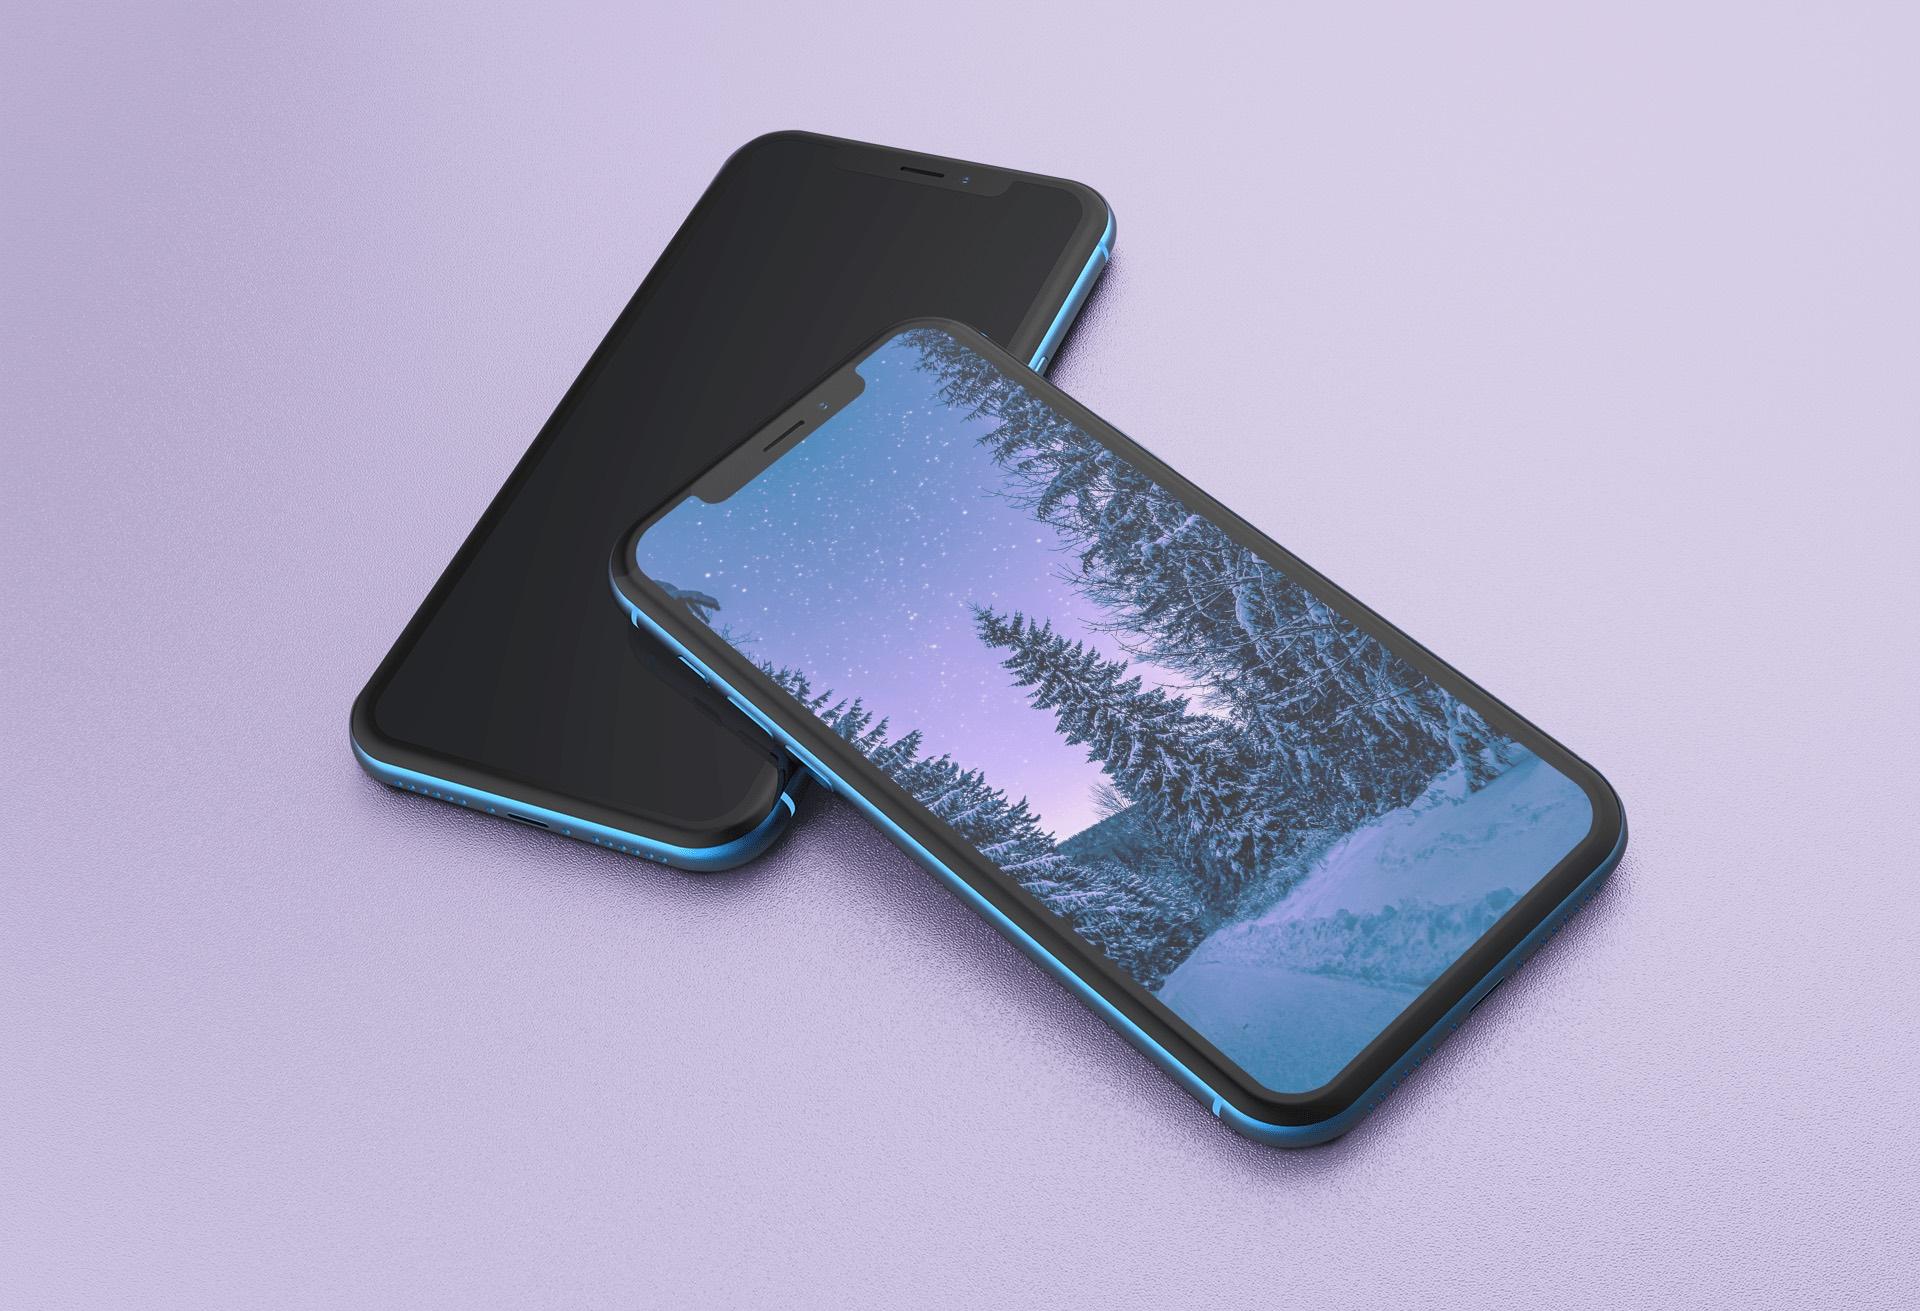 4K Winter Wallpapers For IPhone, IPad, Or MacBook